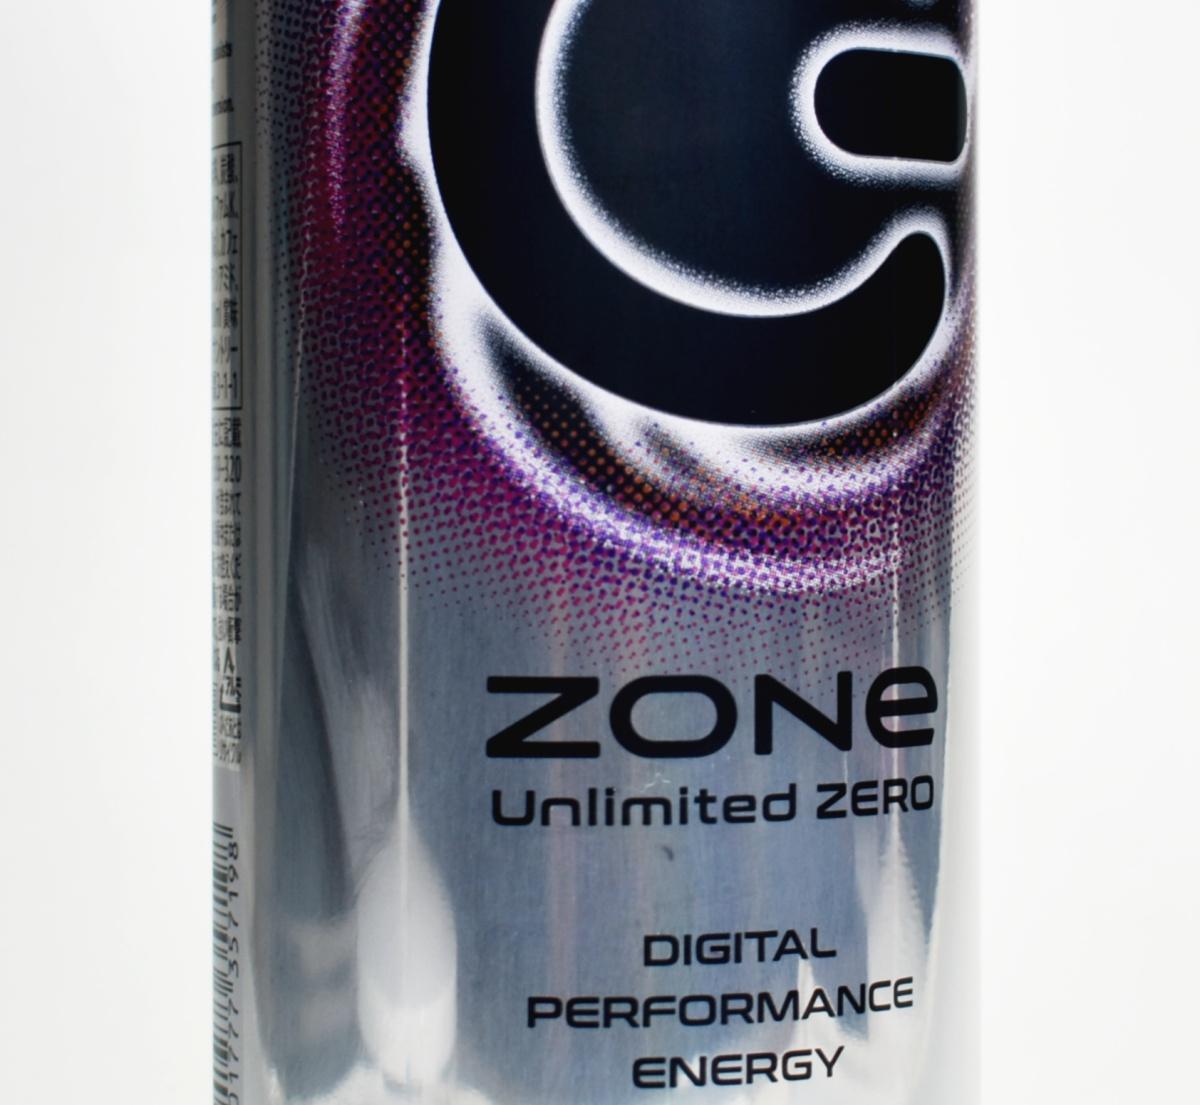 ZONe Unlimited ZERO Ver.1.0.0,ゾーン・アンリミテッド・ゼロ